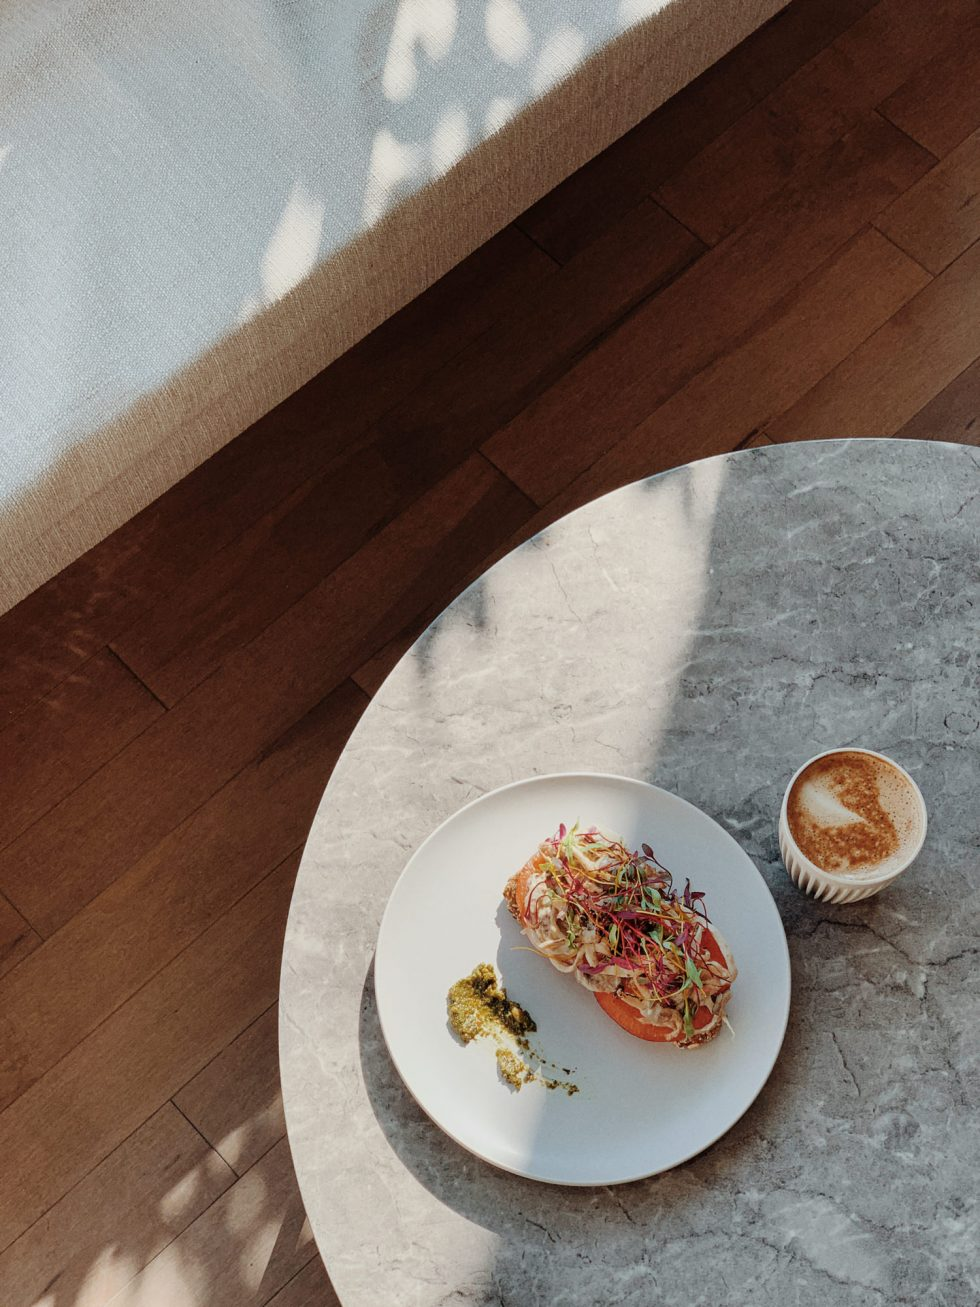 archway-bar-vegan-restaurant-food-montreal-lifestyle-photographer-laura-g-diaz-2